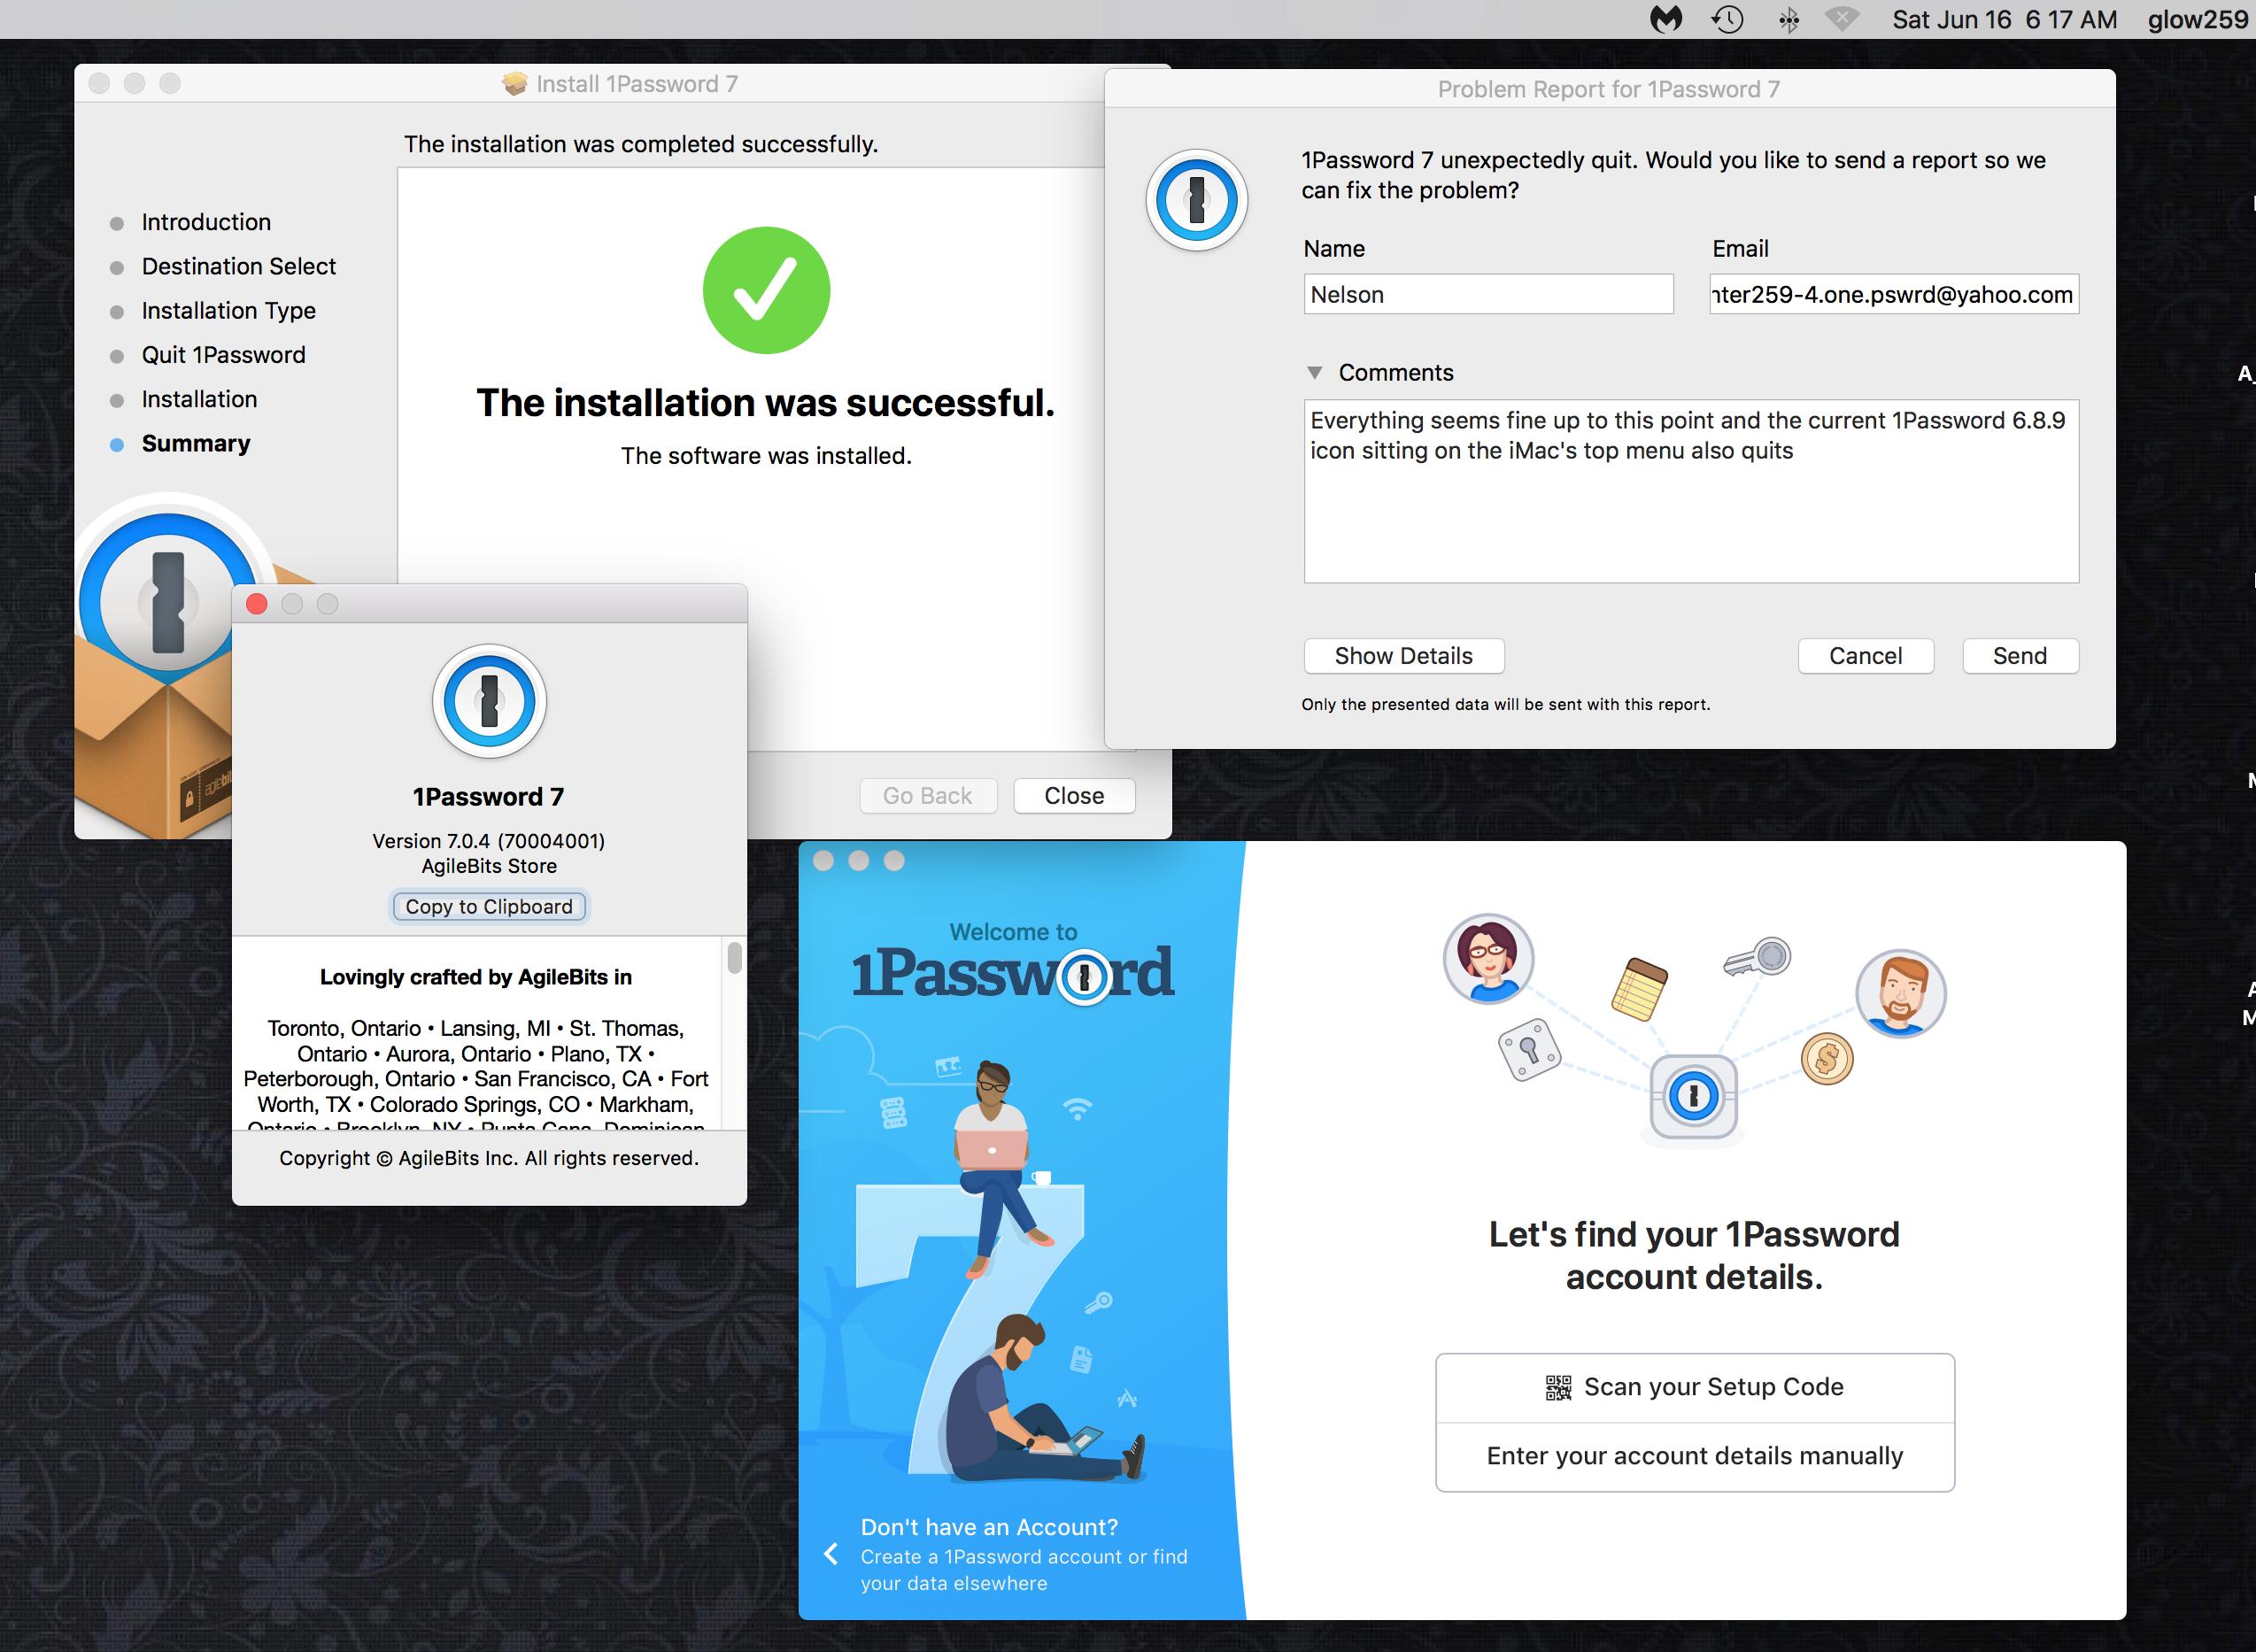 Problem with 1Password auto-login on my iMac High Sierra